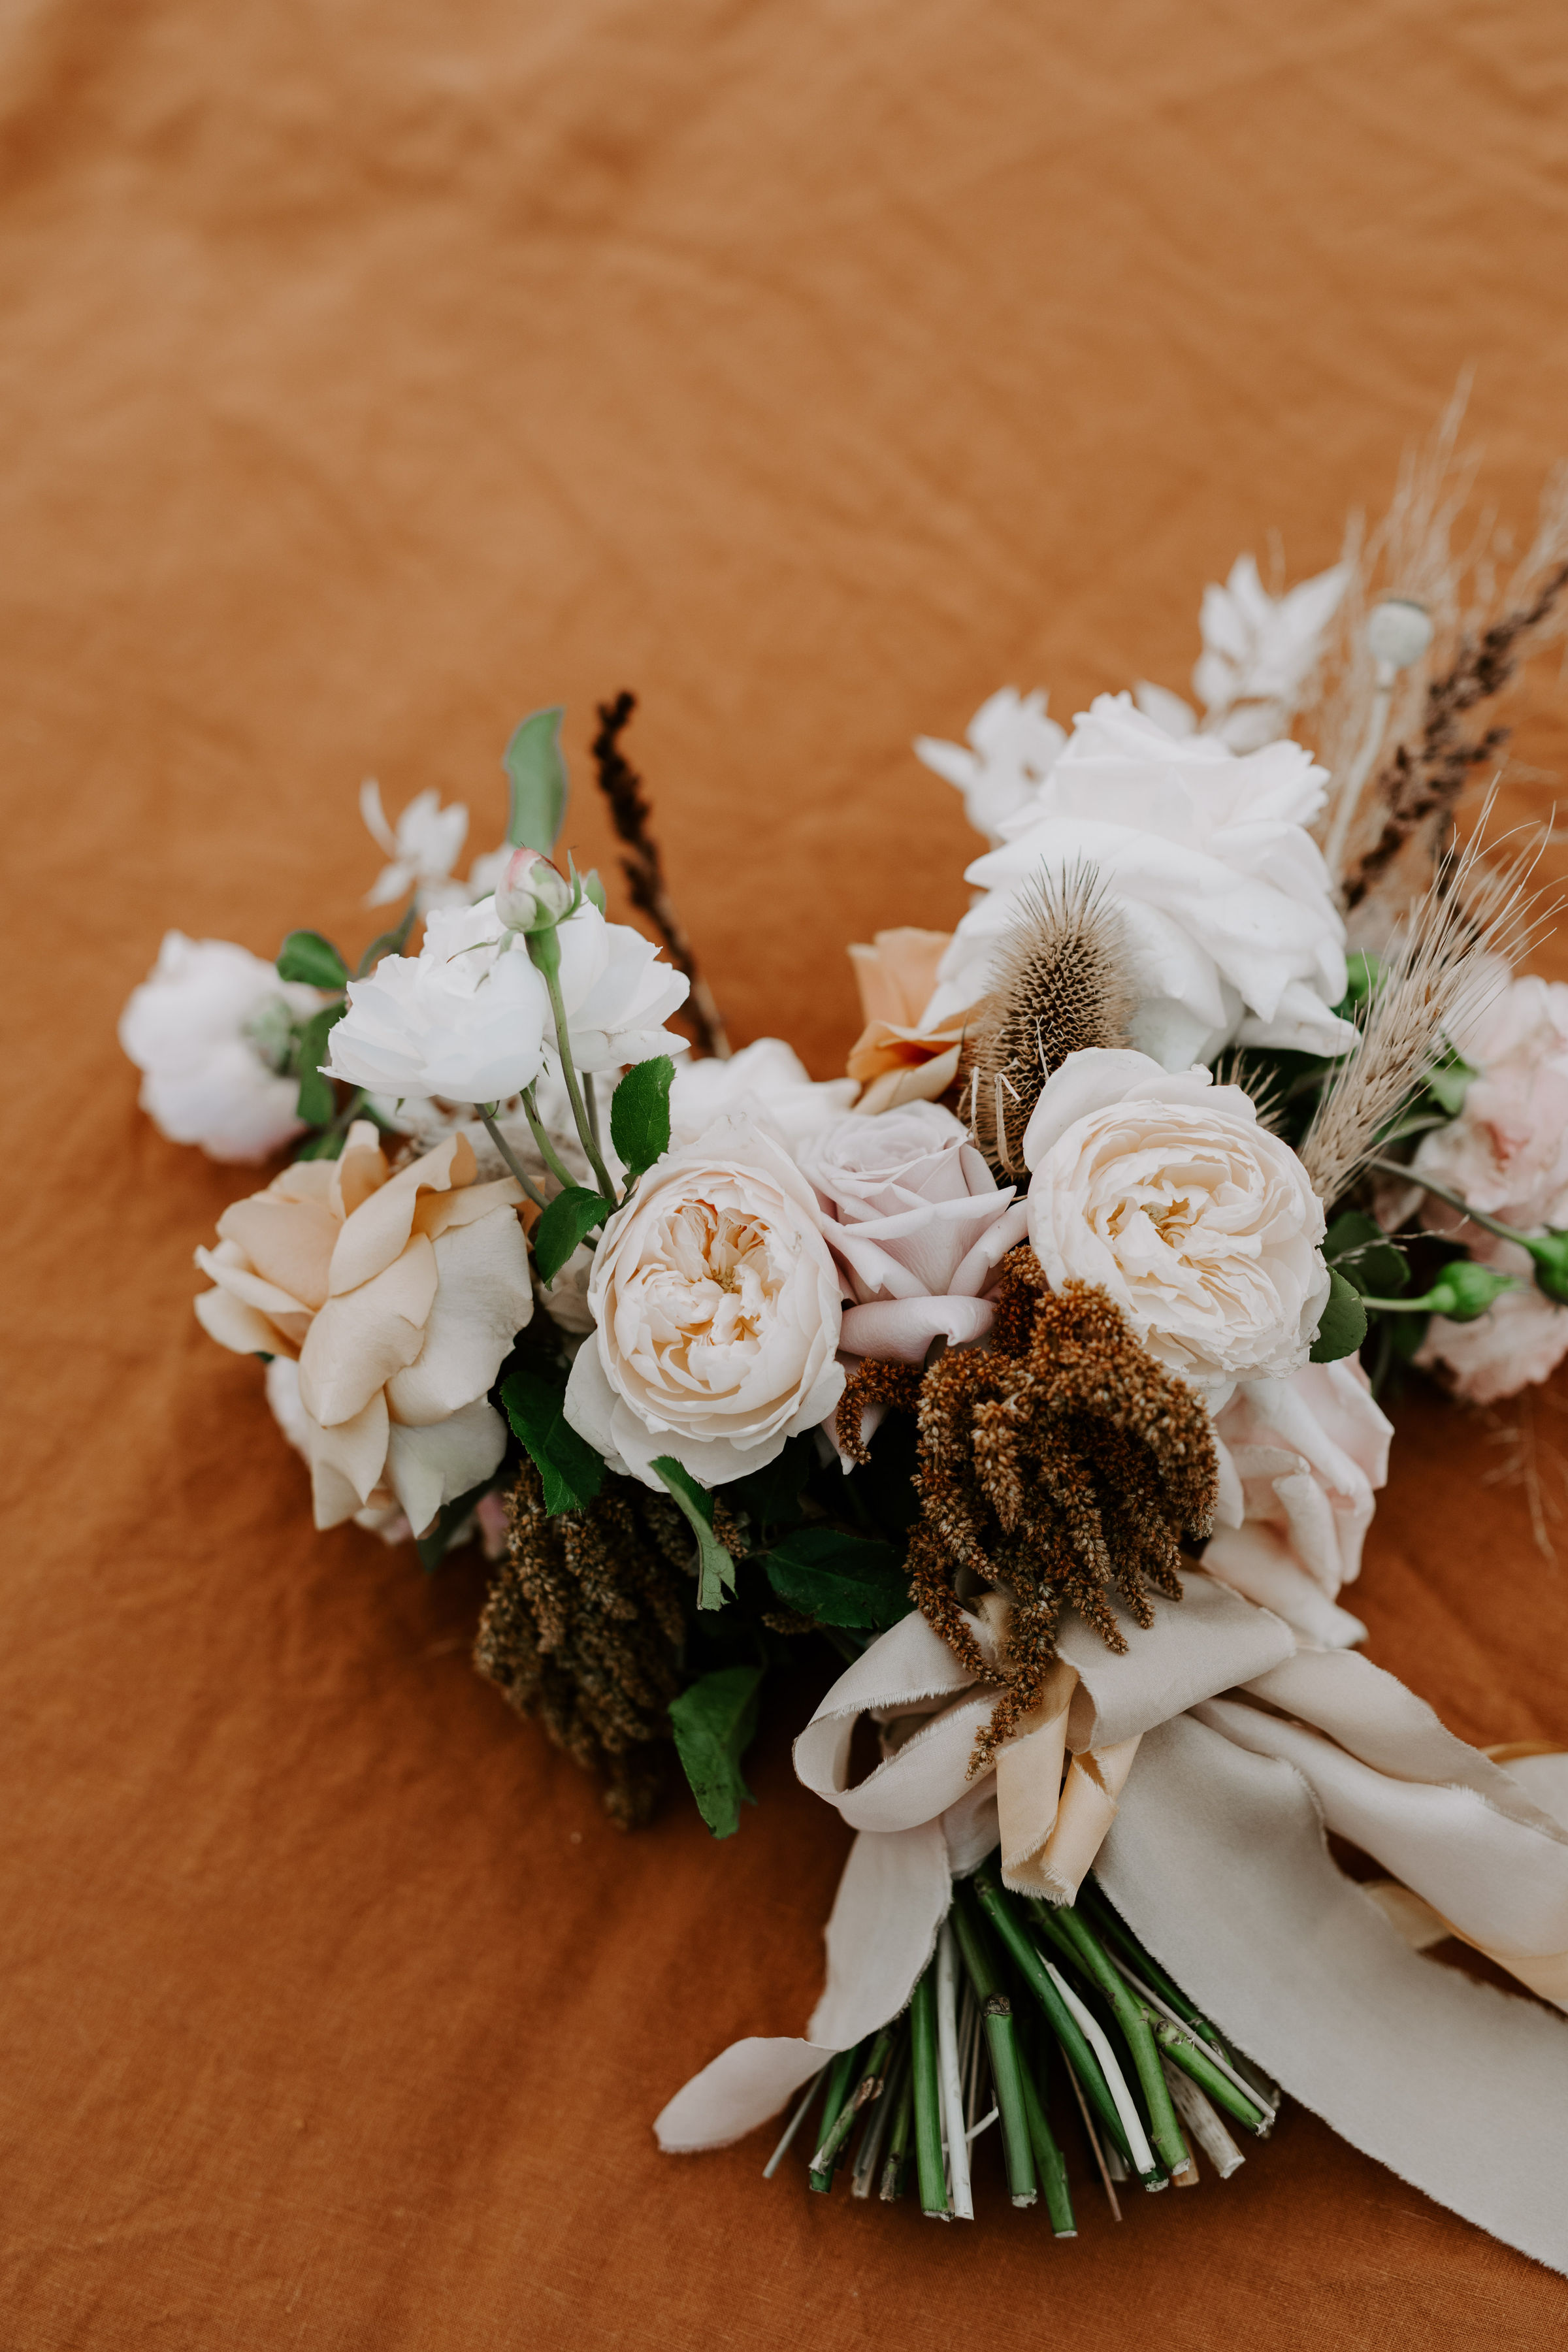 the-wiluna-bride-canberra-bridal-mrs-fray3.jpg